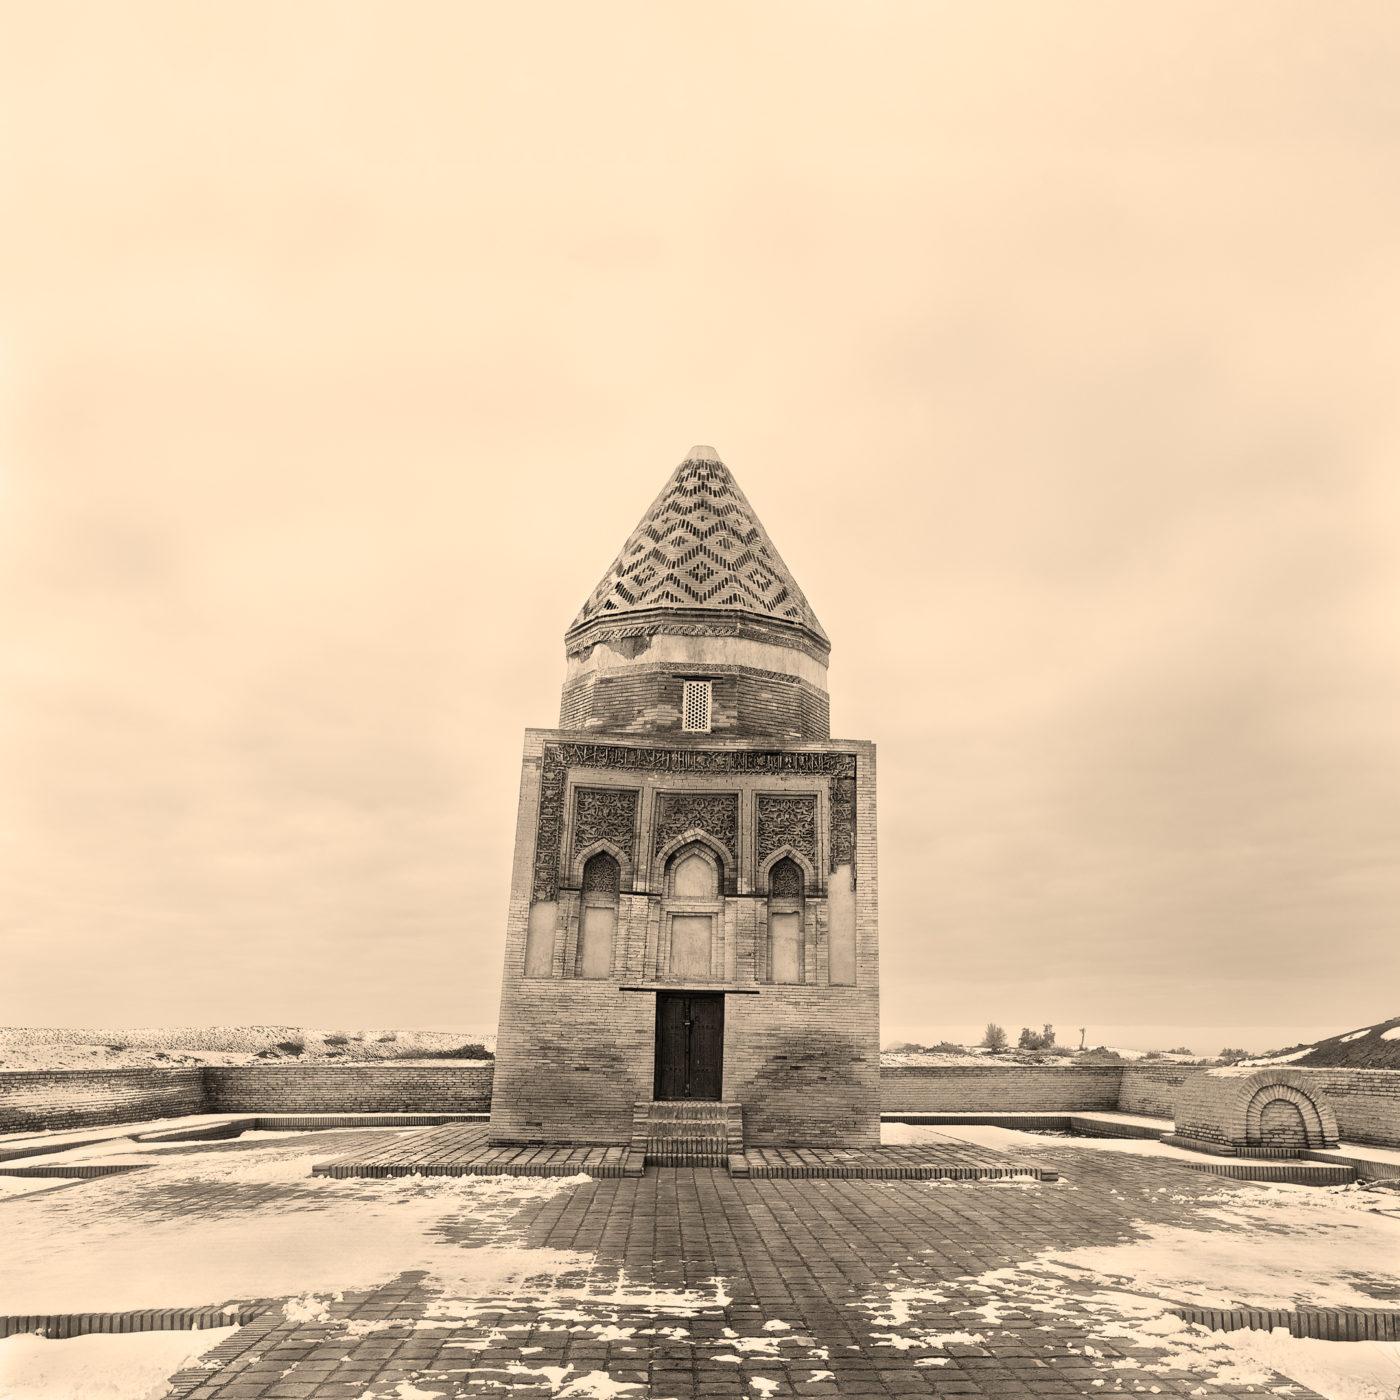 Turkmen, Kunya Urgench, クフナ・ウルゲンチ, トルクメニスタン, シルクロード, silk road, world heritage, 世界遺産